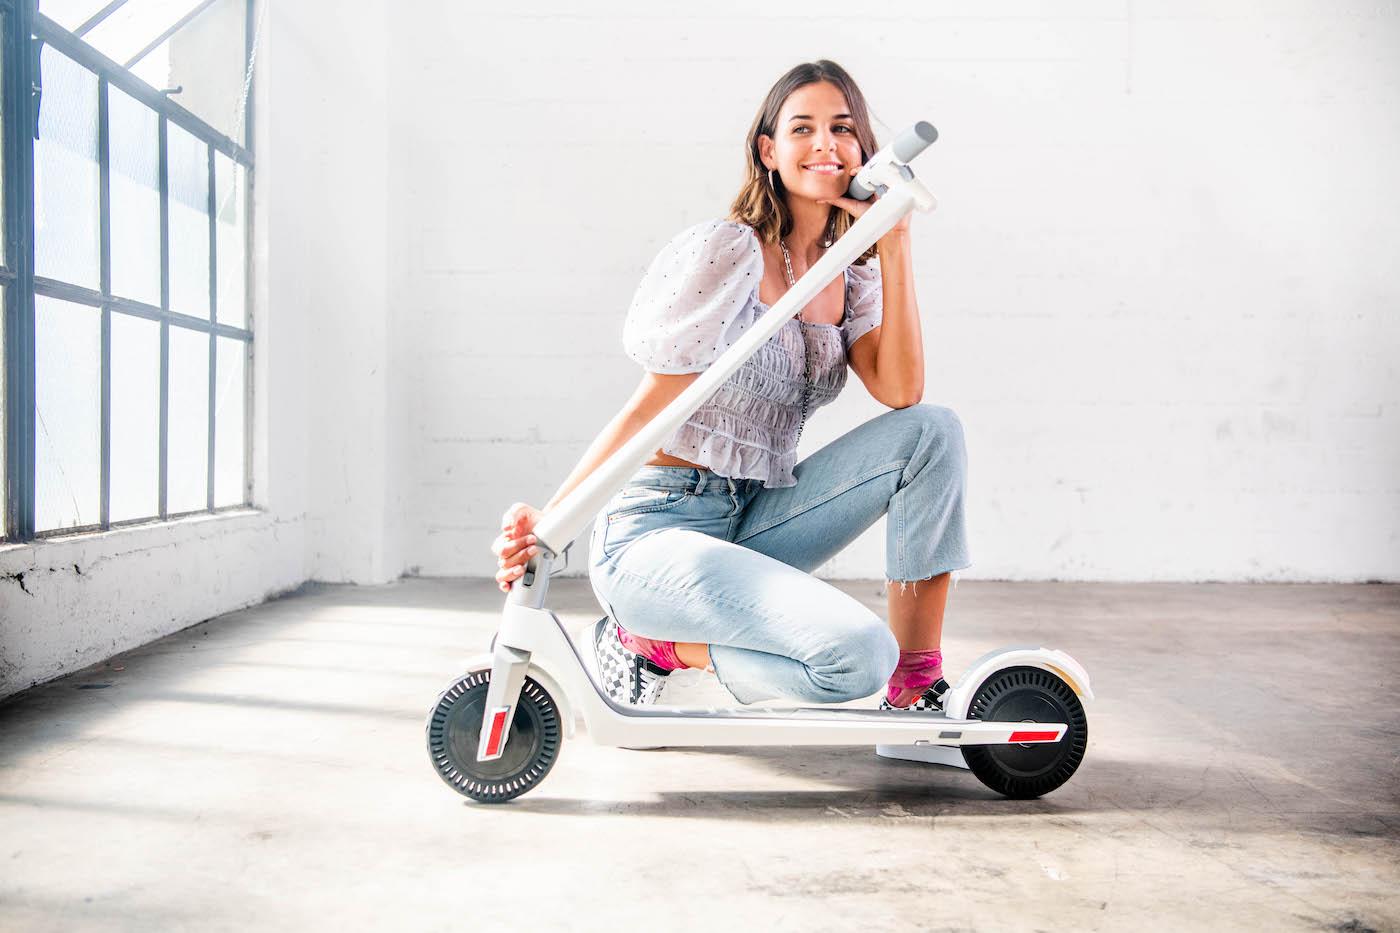 Unagi 推出私人電動滑板車訂閱,這樣您就不會與陌生人分享